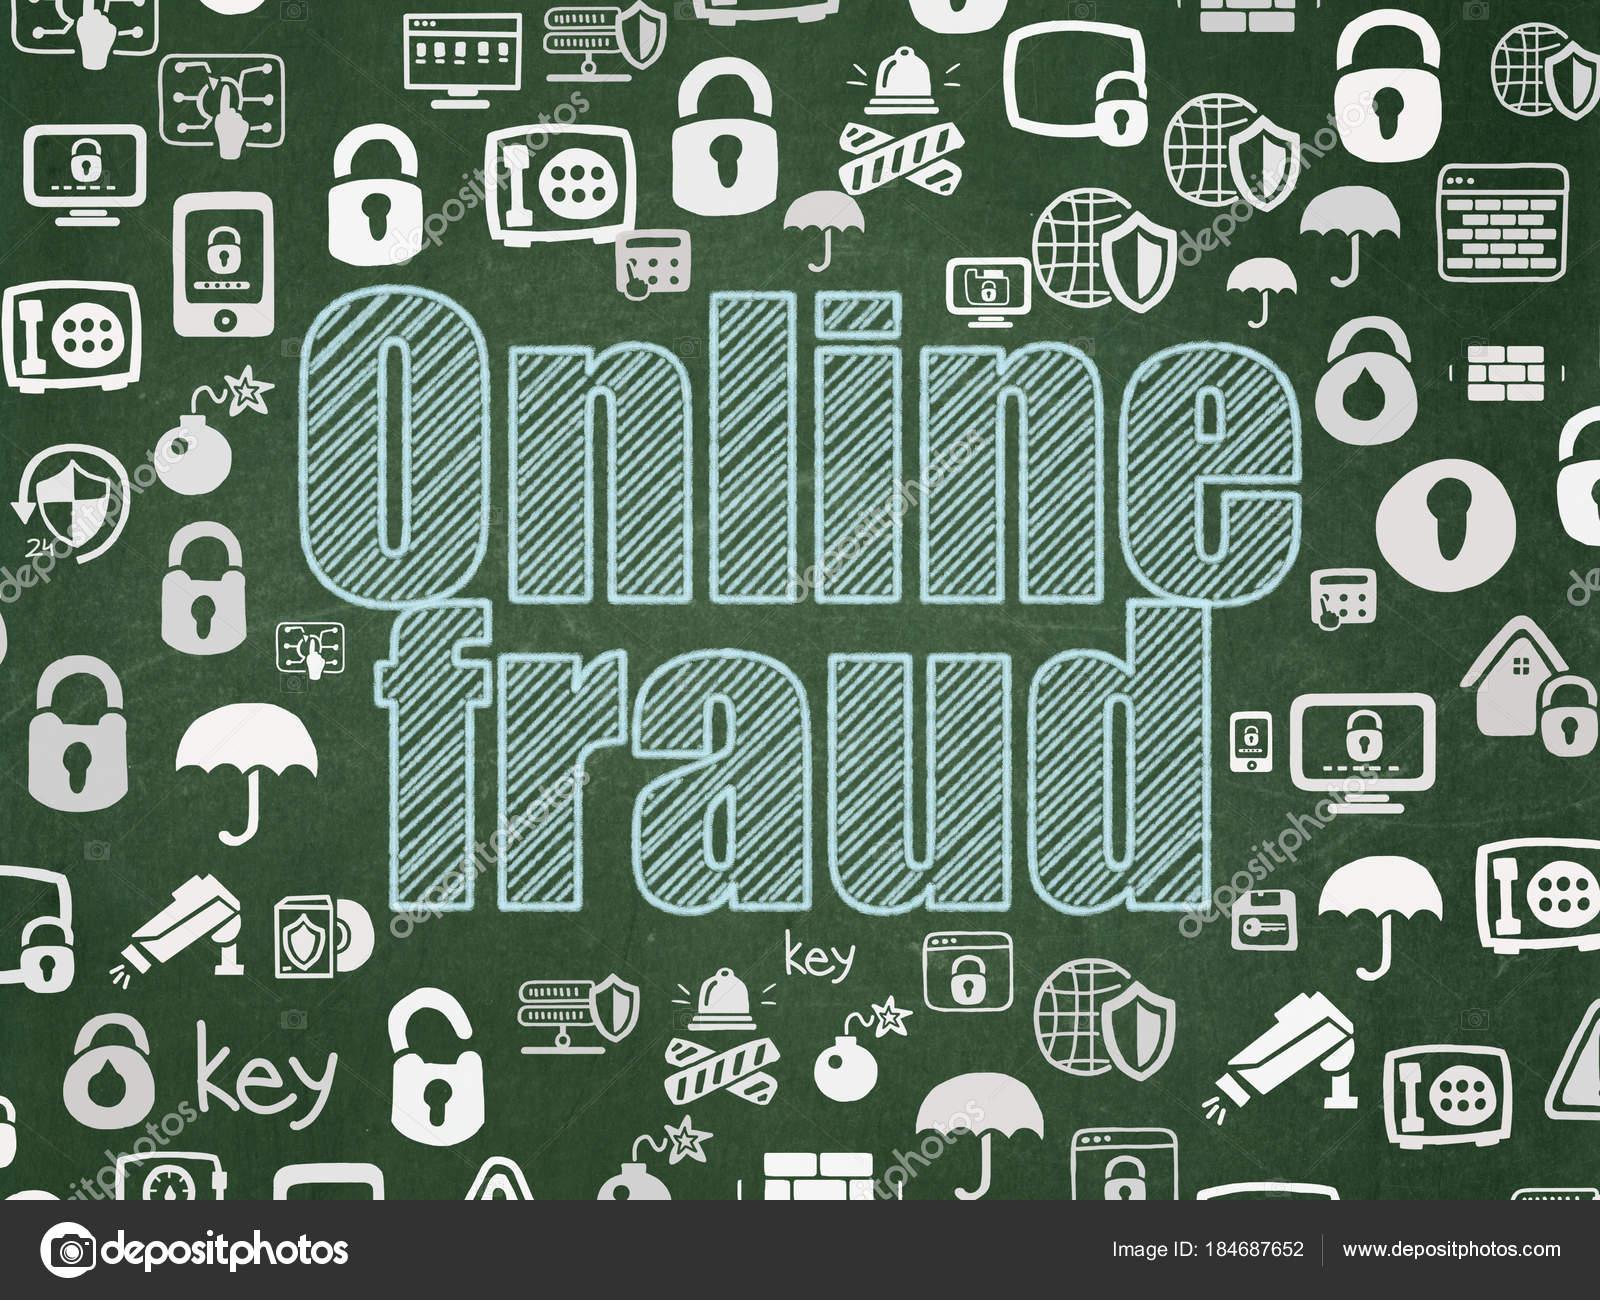 Co je online podvody